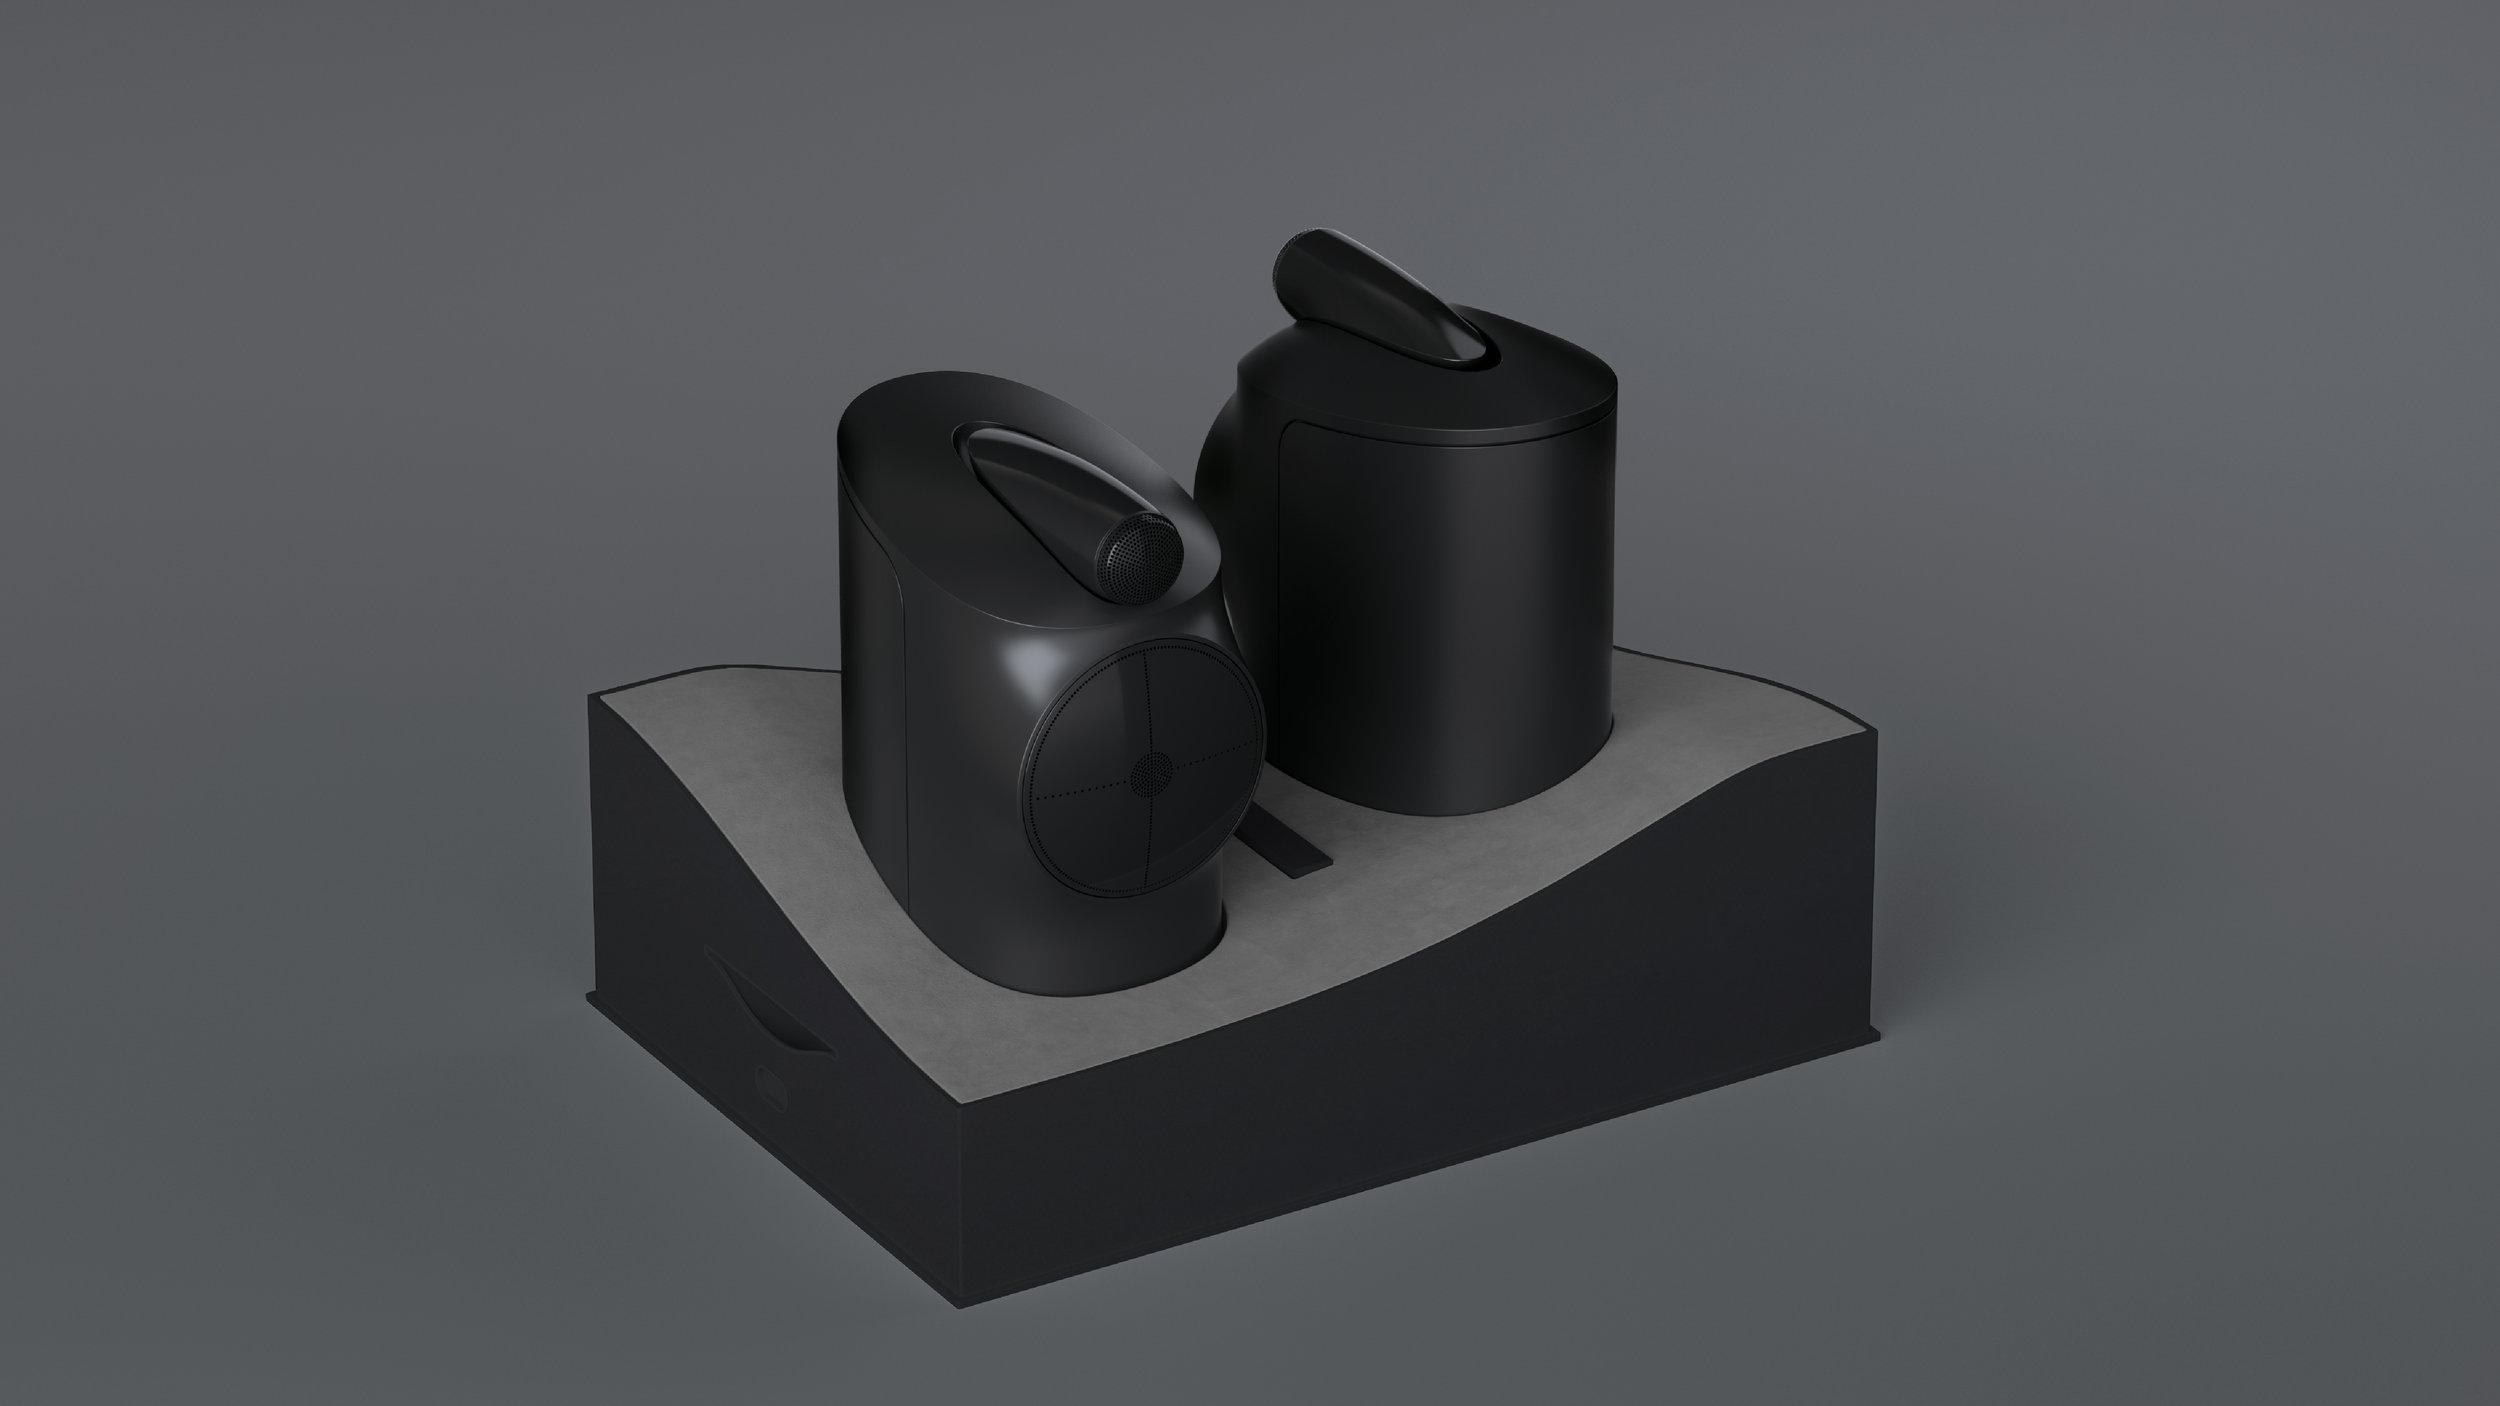 B&W_LibertySuite_PackagingStructure_R18.jpg